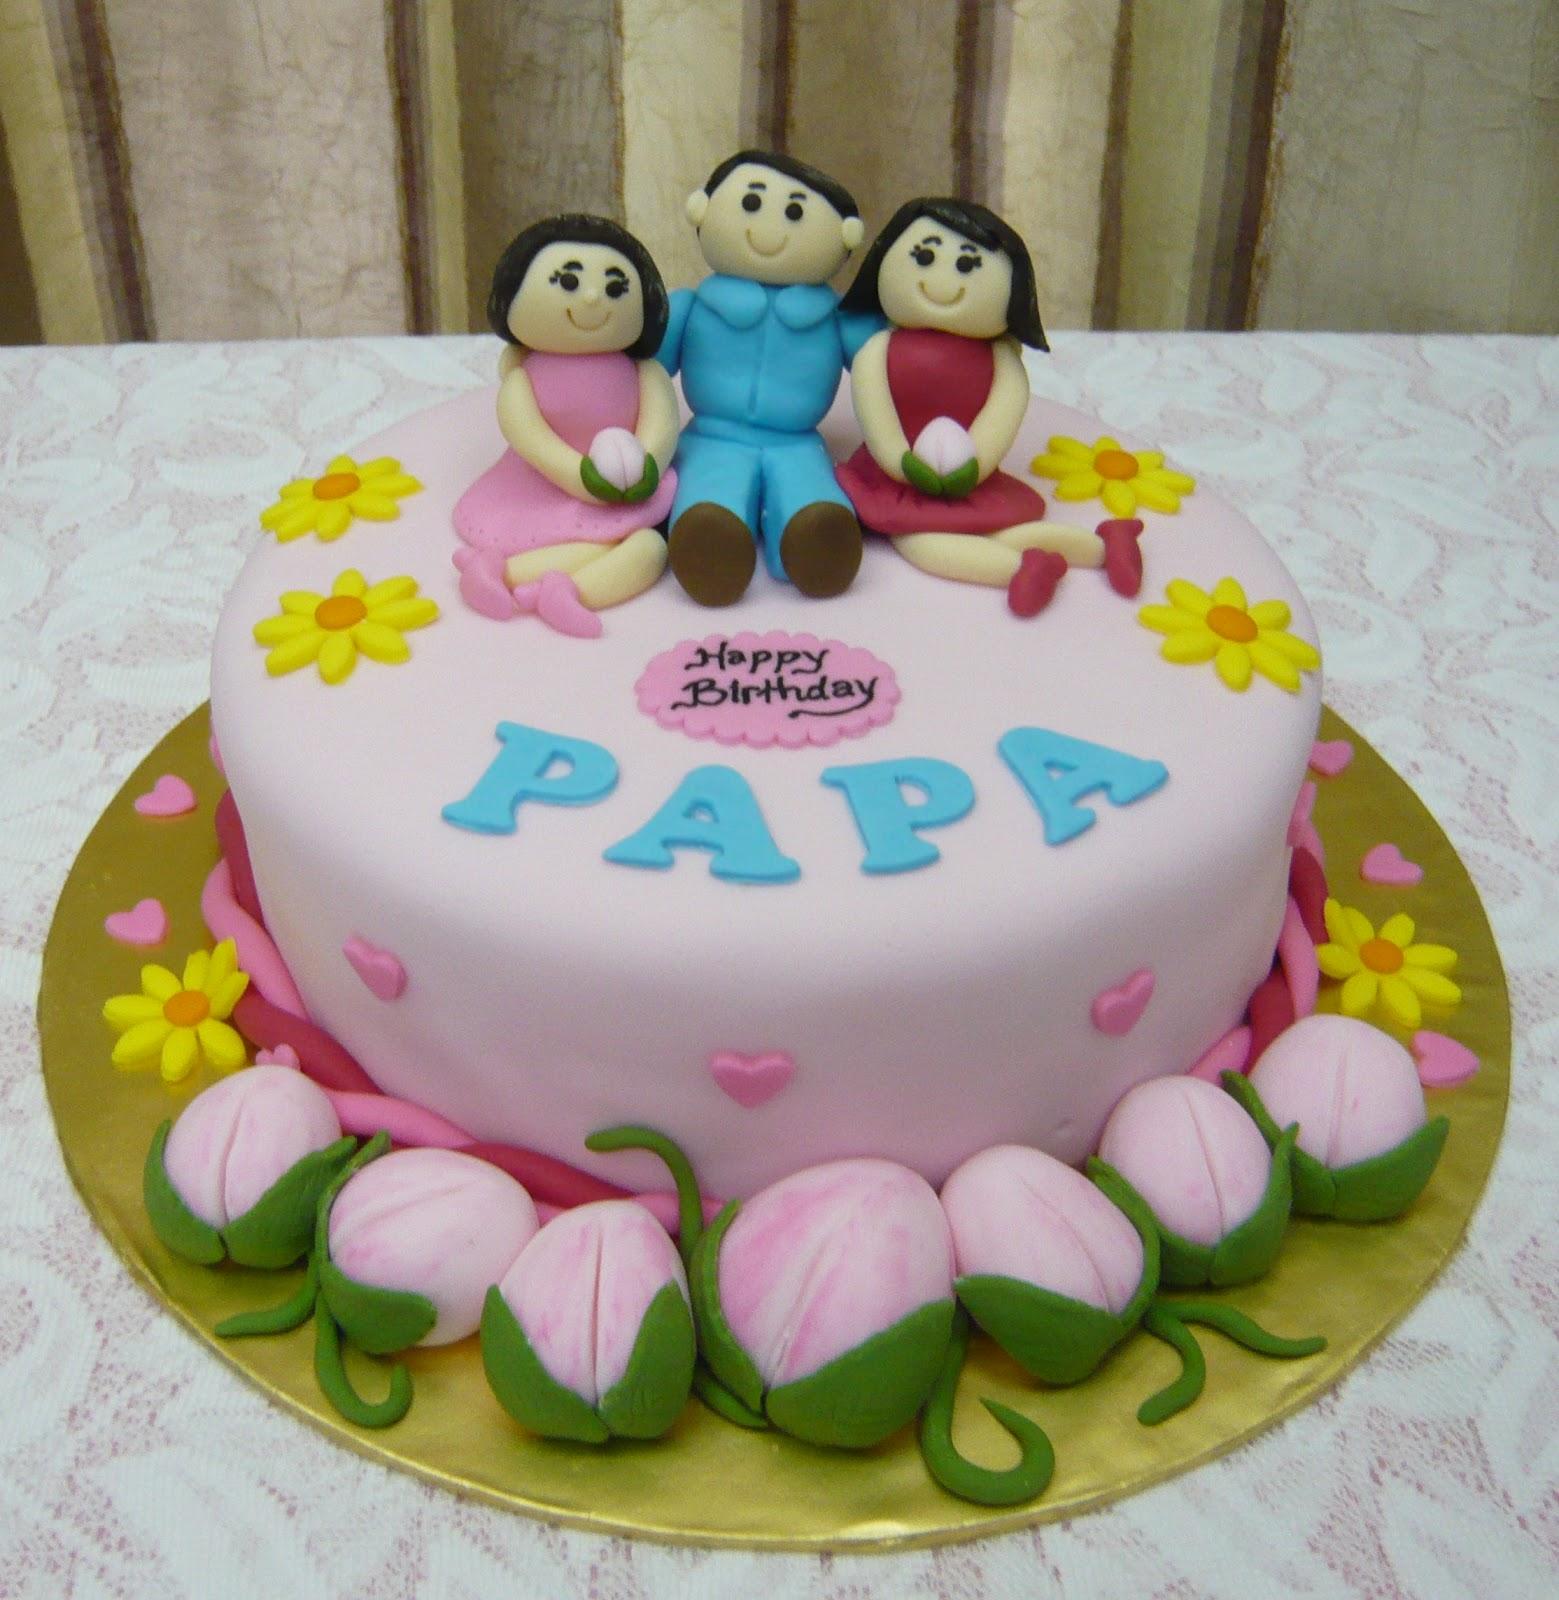 Jenn Cupcakes & Muffins: Happy Birthday Papa